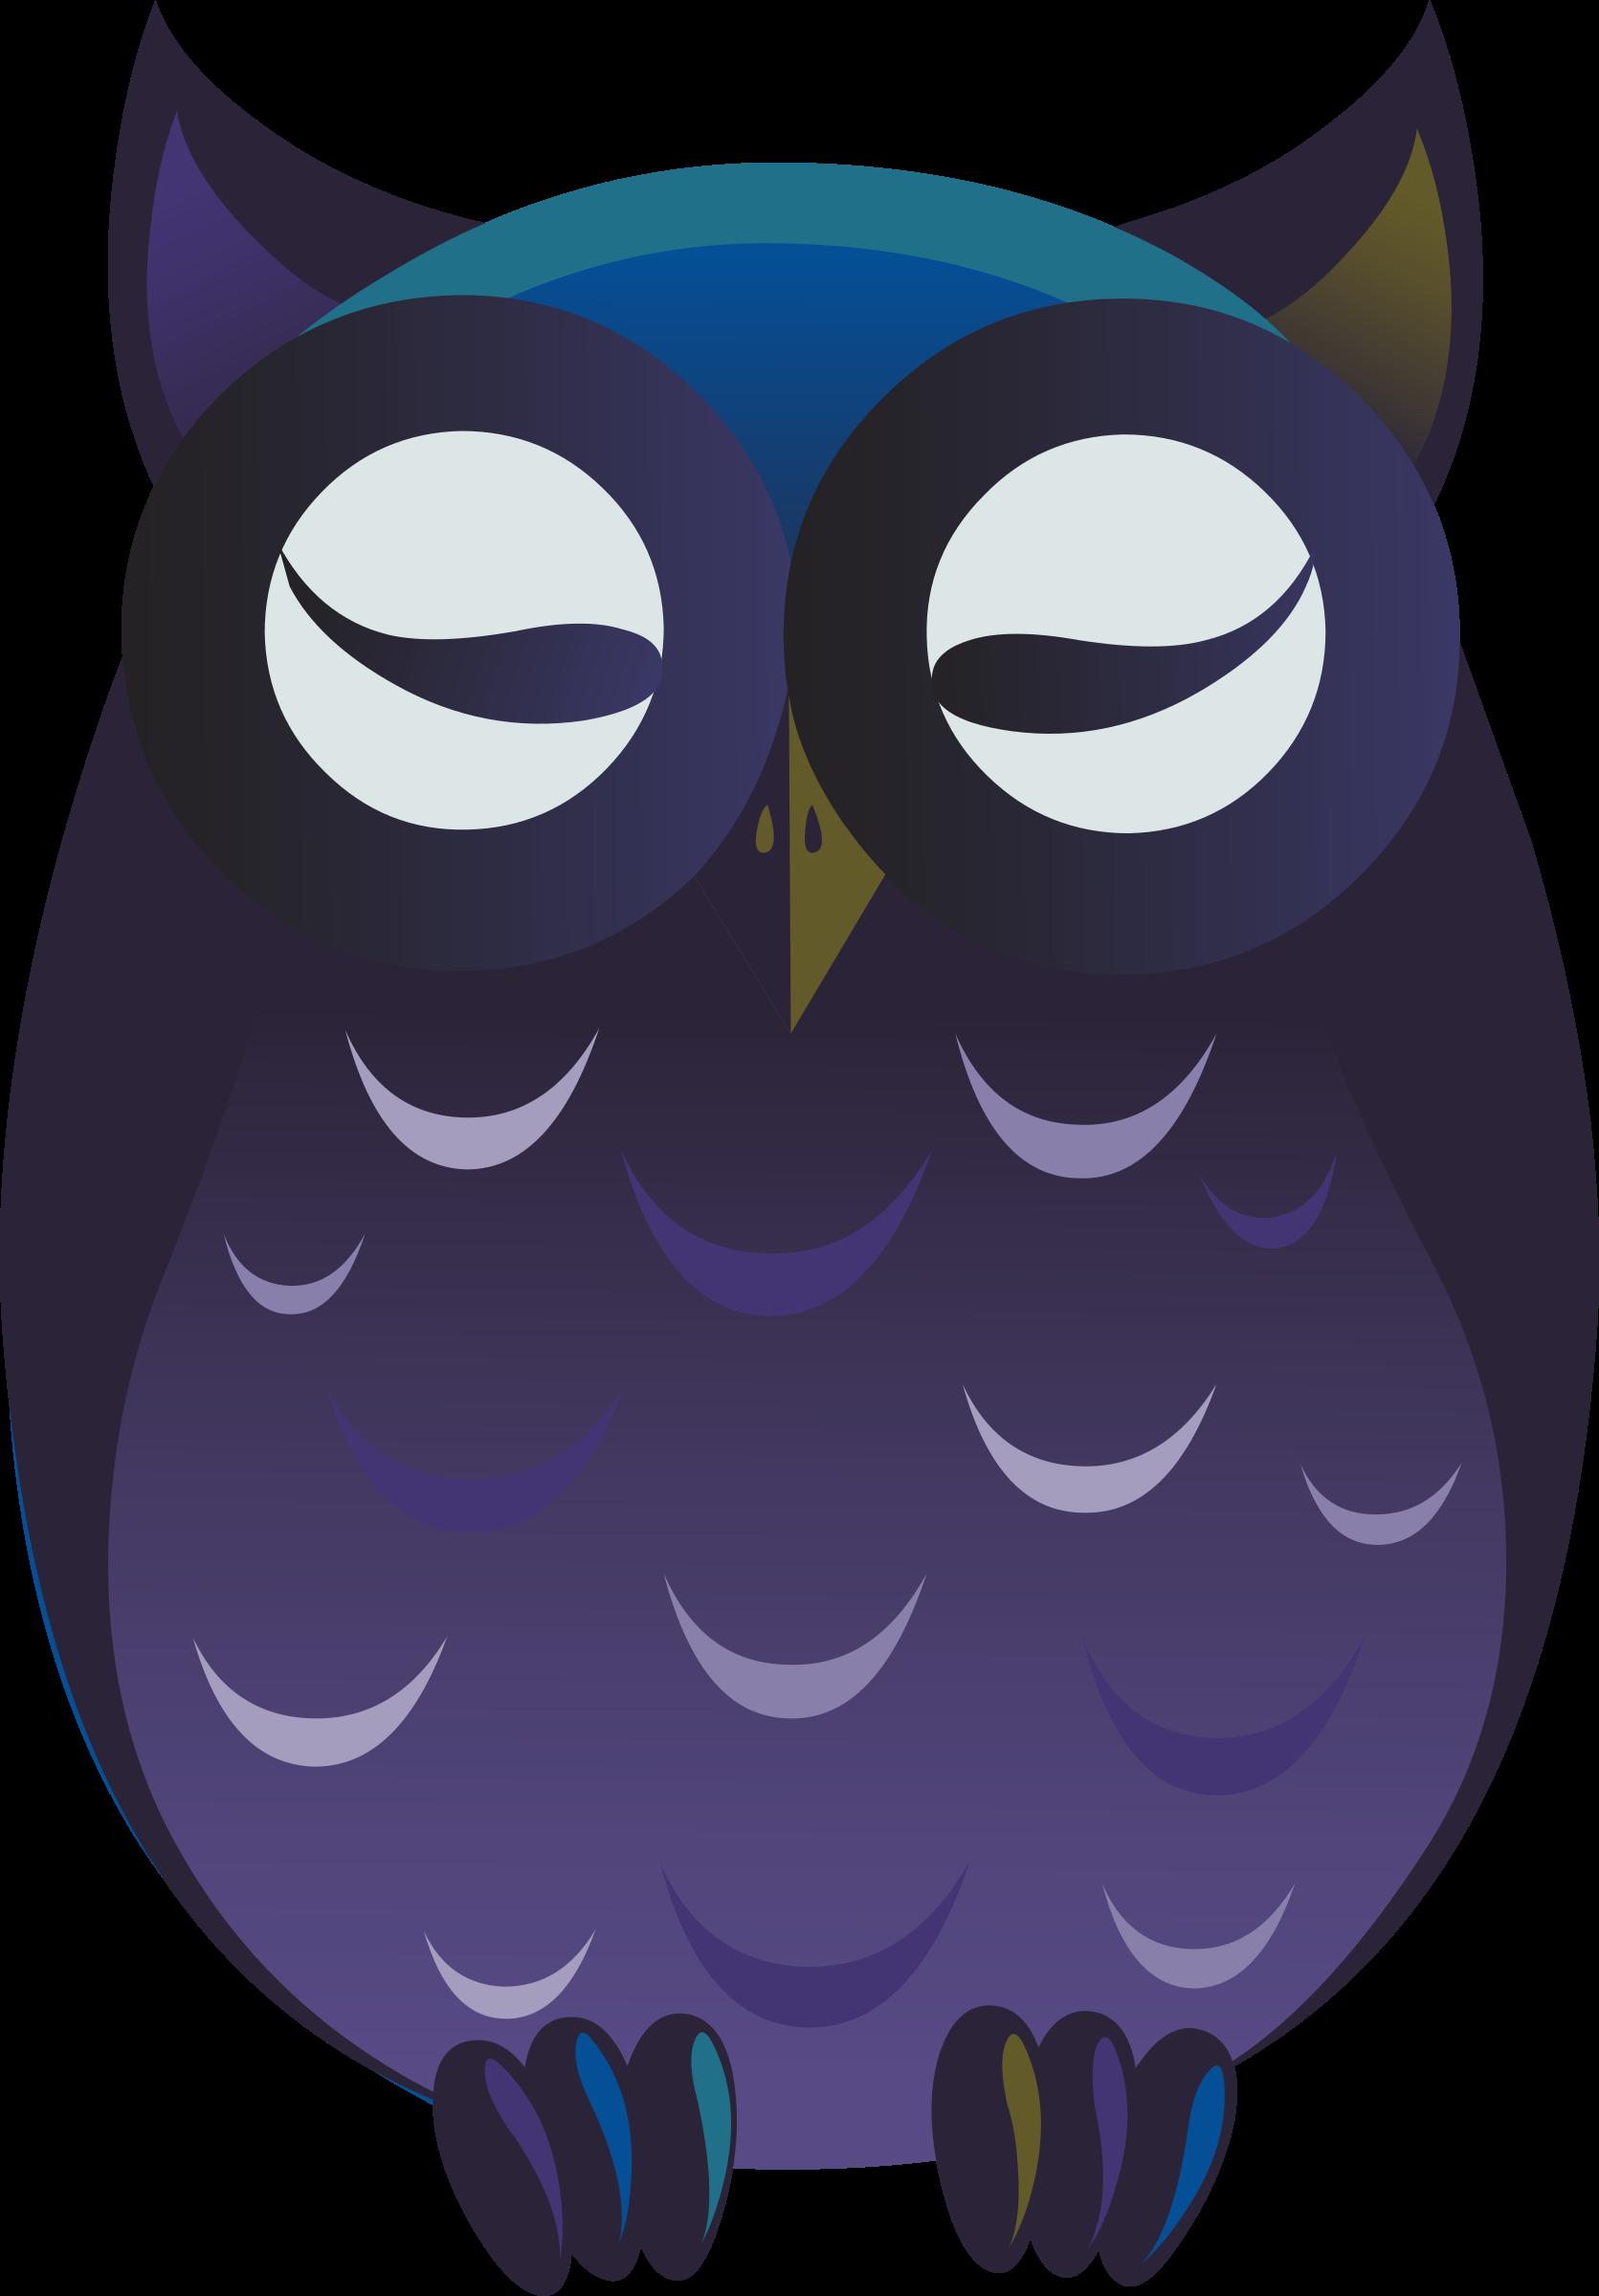 Glitch clipart cartoon Owl Ilmenskie IMAGE (PNG) 1